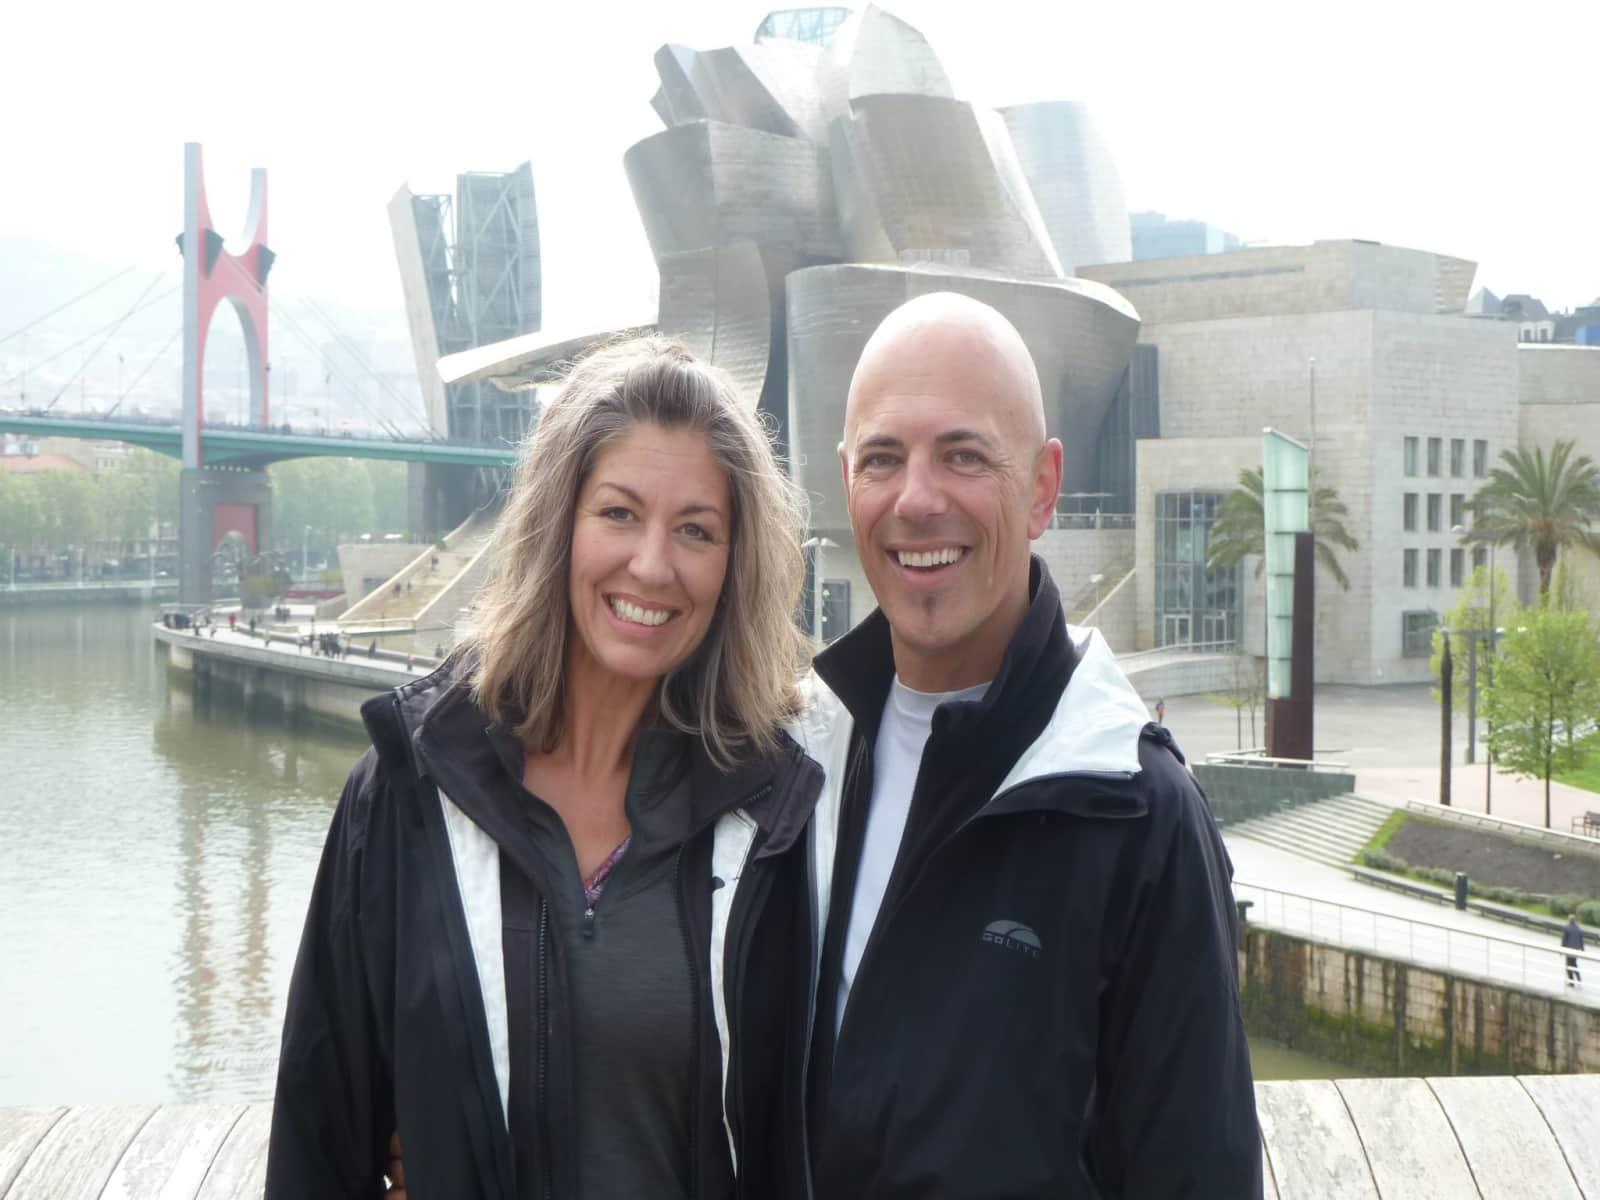 Audra & Greg from Bellevue, Washington, United States